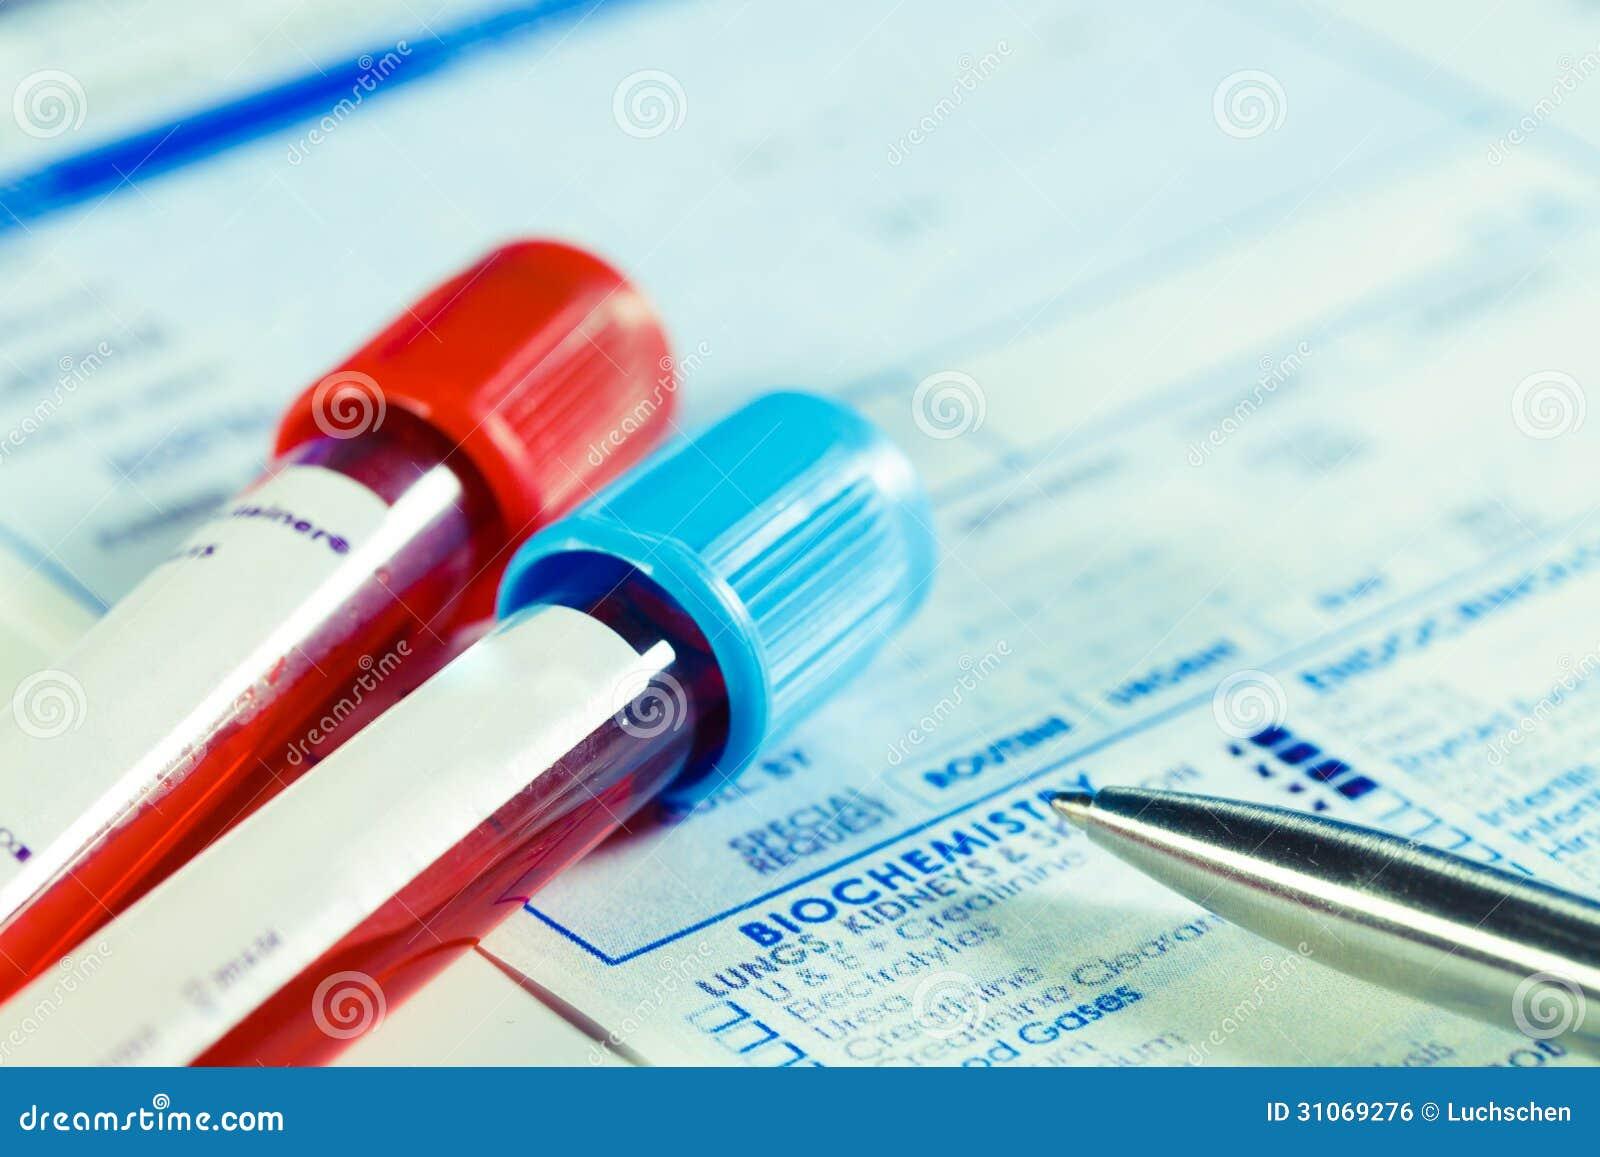 Analisi del sangue di biochimica